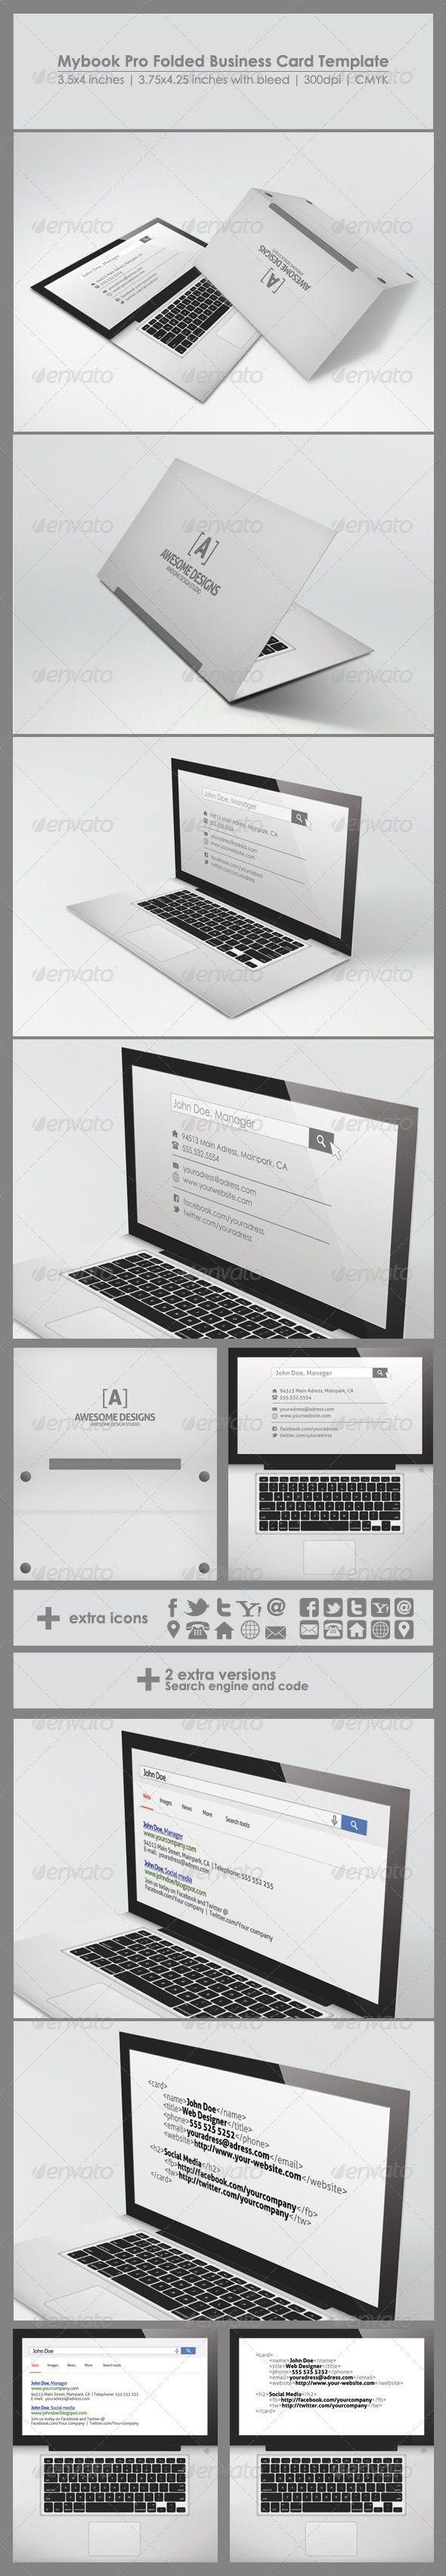 1000+ images about Webdesign Elements on Pinterest | UX/UI ...